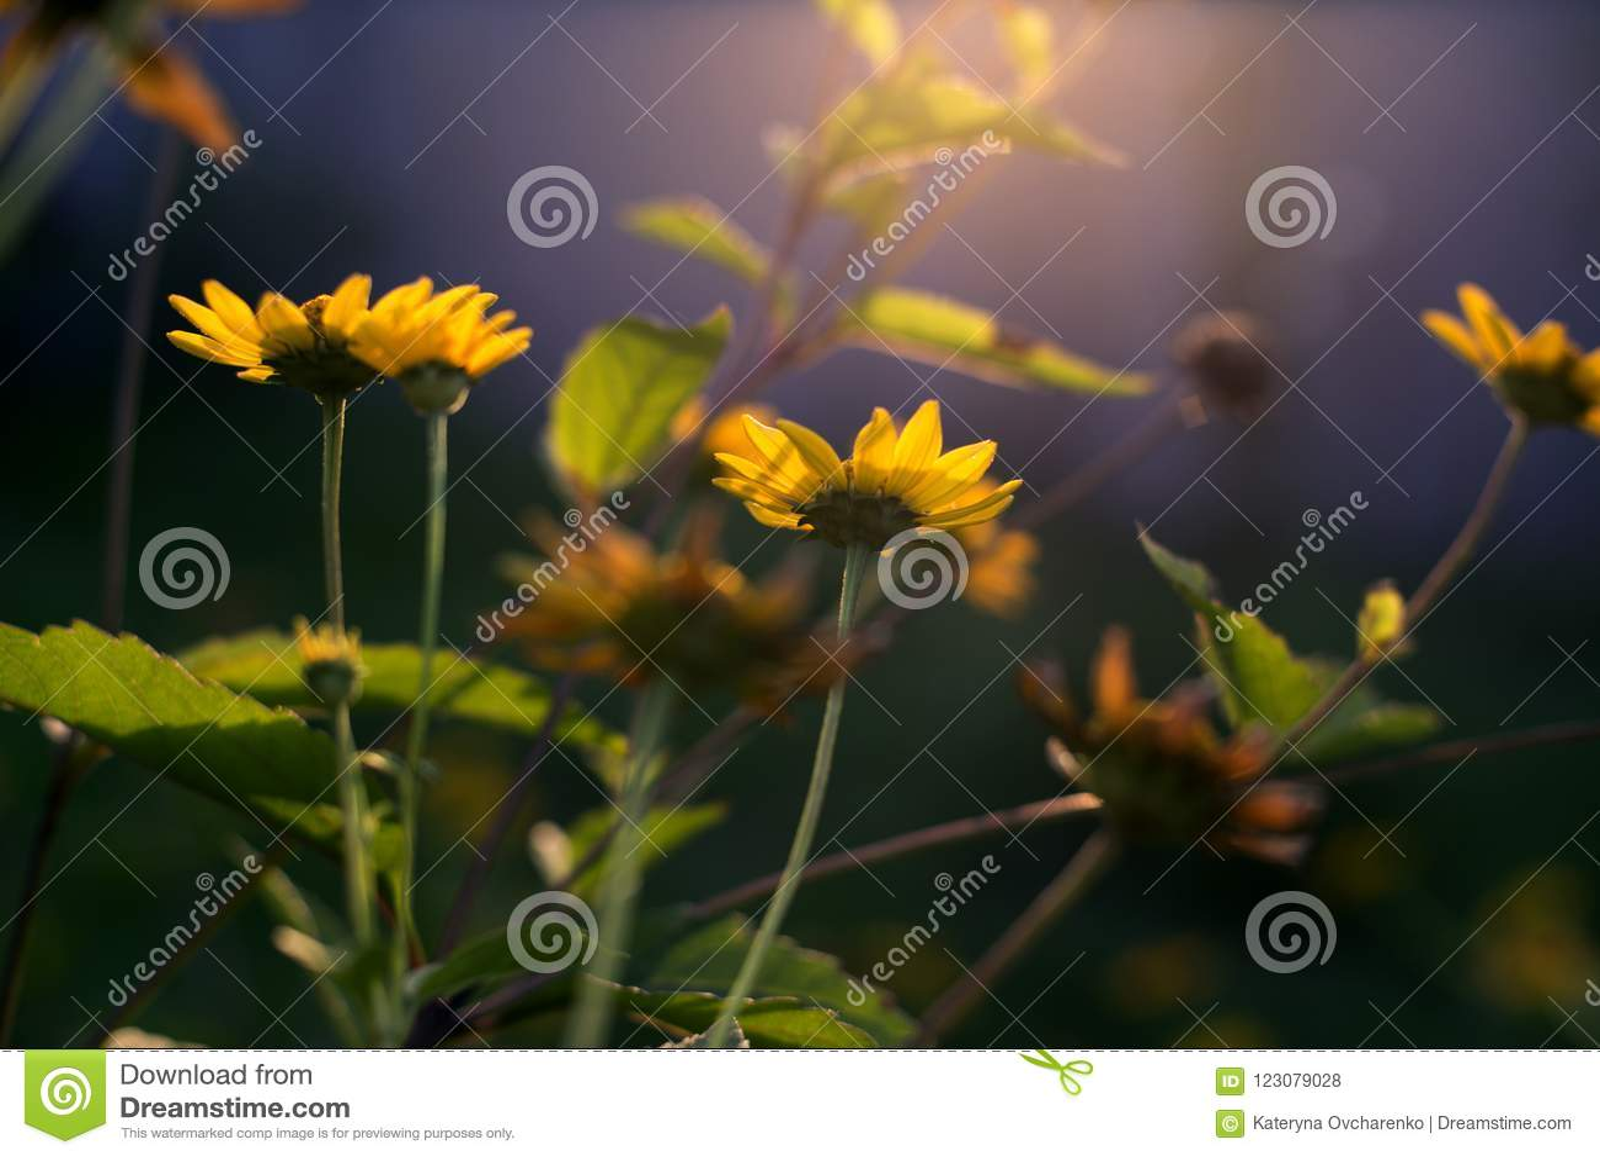 Sunny Yellow Flowers Background Stock Photo Image Of Grow Closeup